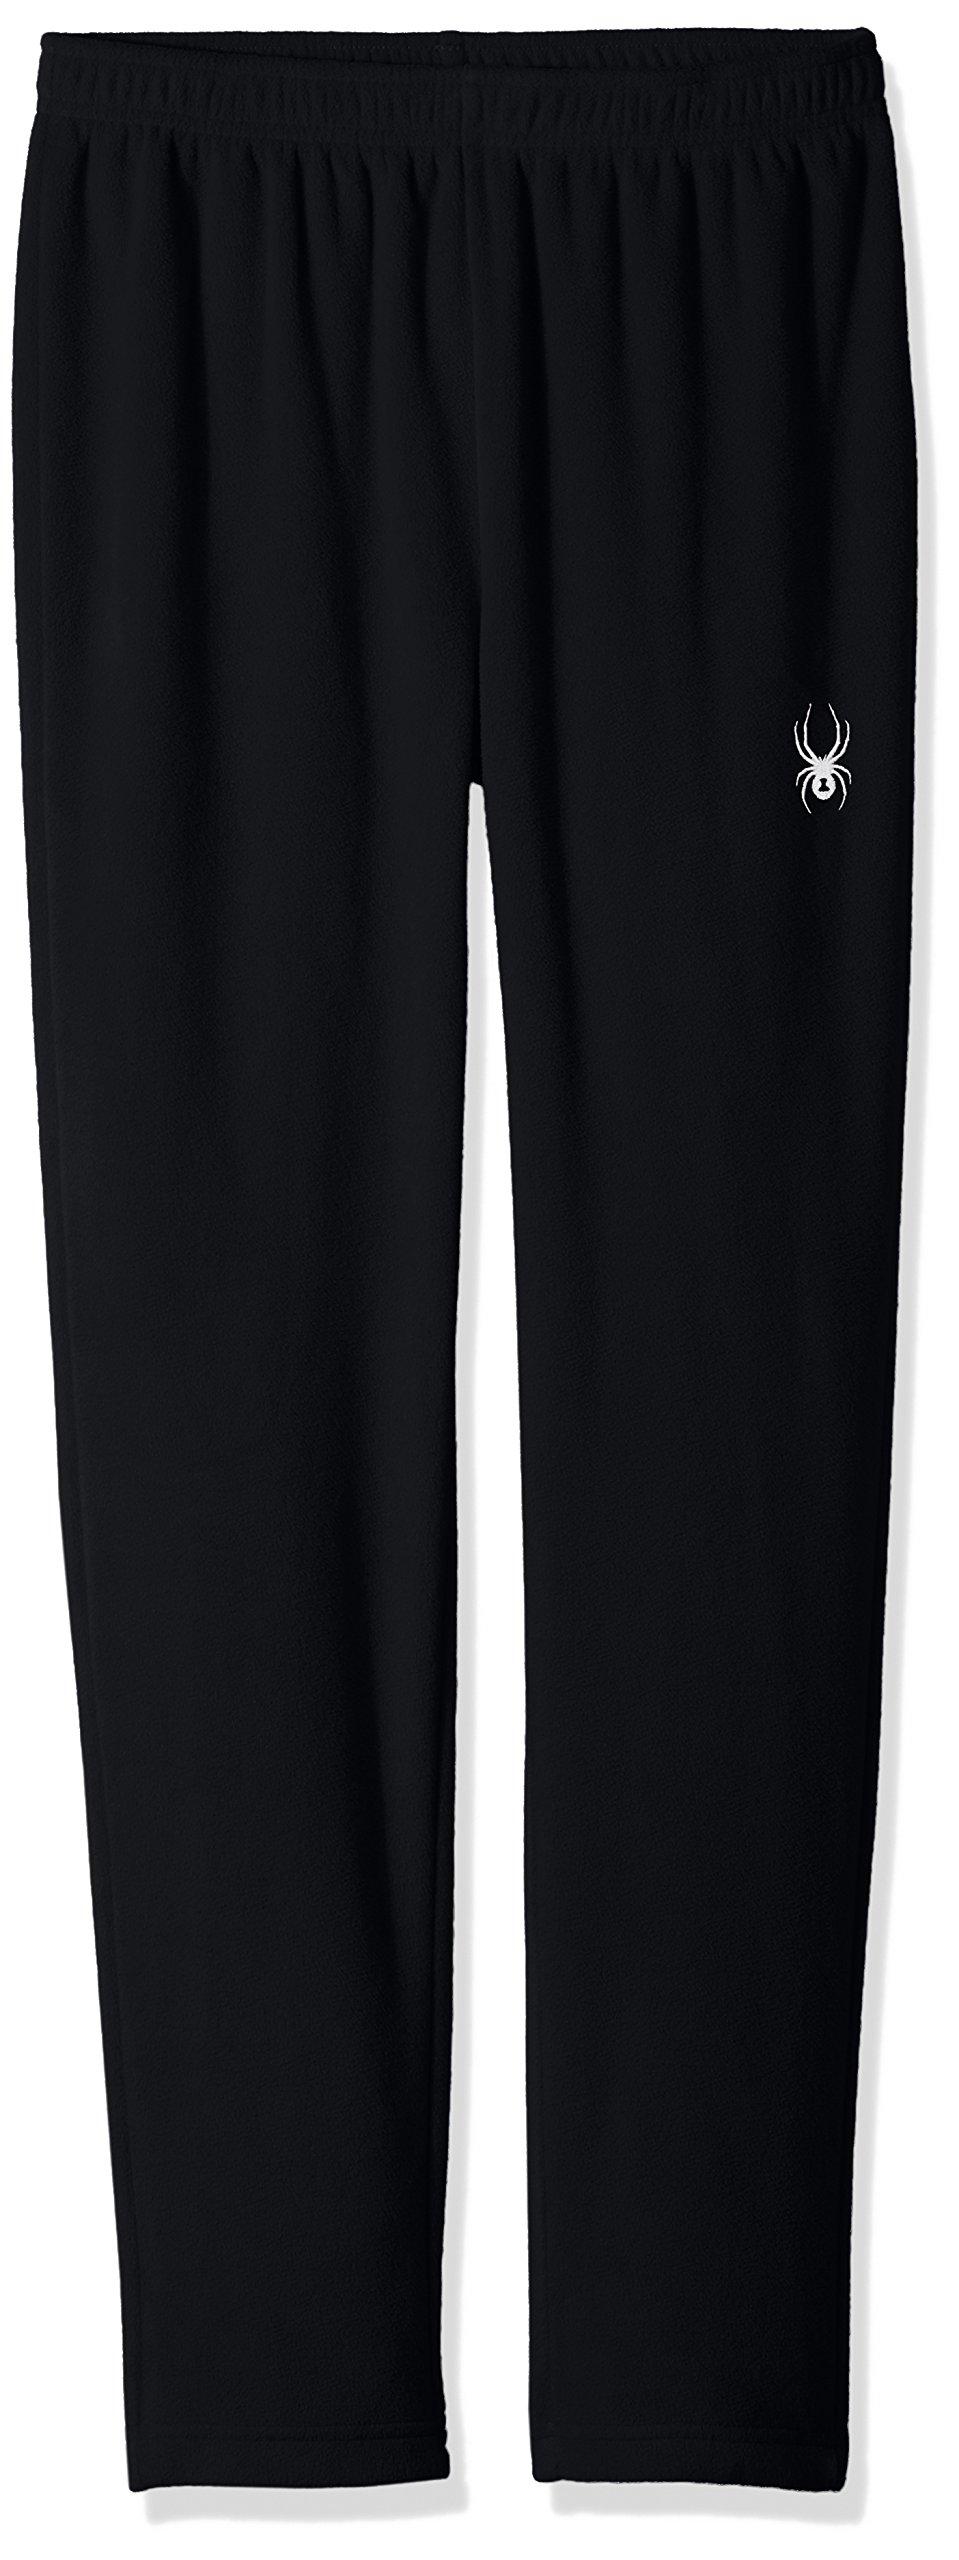 Spyder Boy's Momentum Fleece Pant, Black, Medium